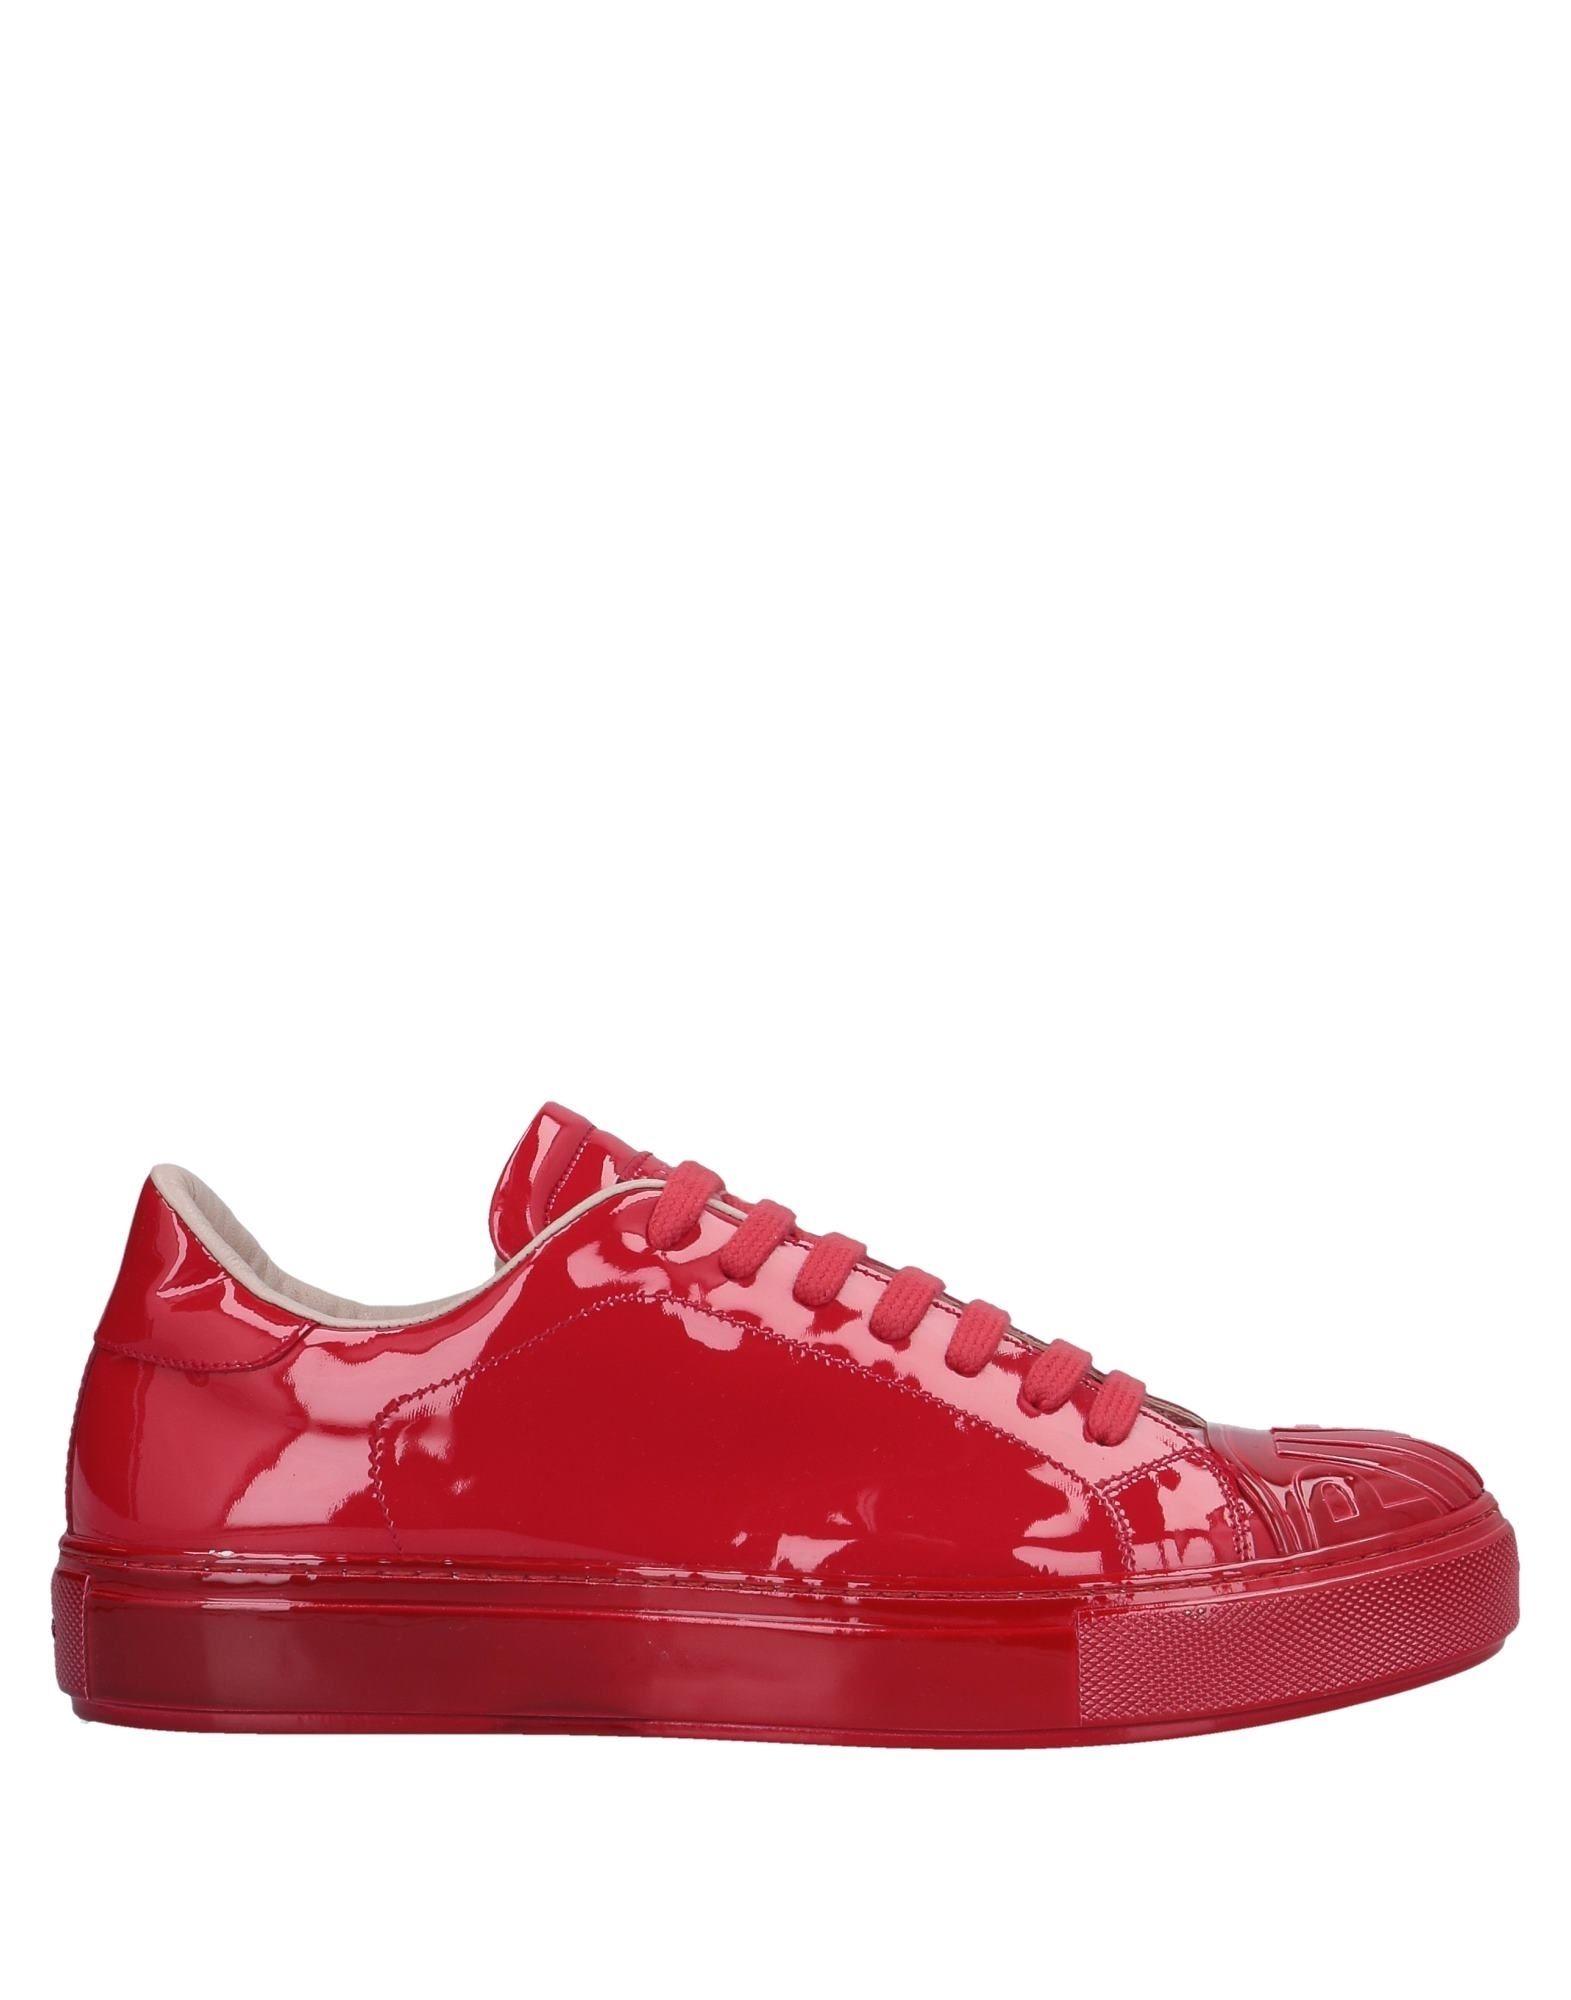 Zapatillas Pinko Mujer - Zapatillas Pinko  Rojo Rojo  81bfc4